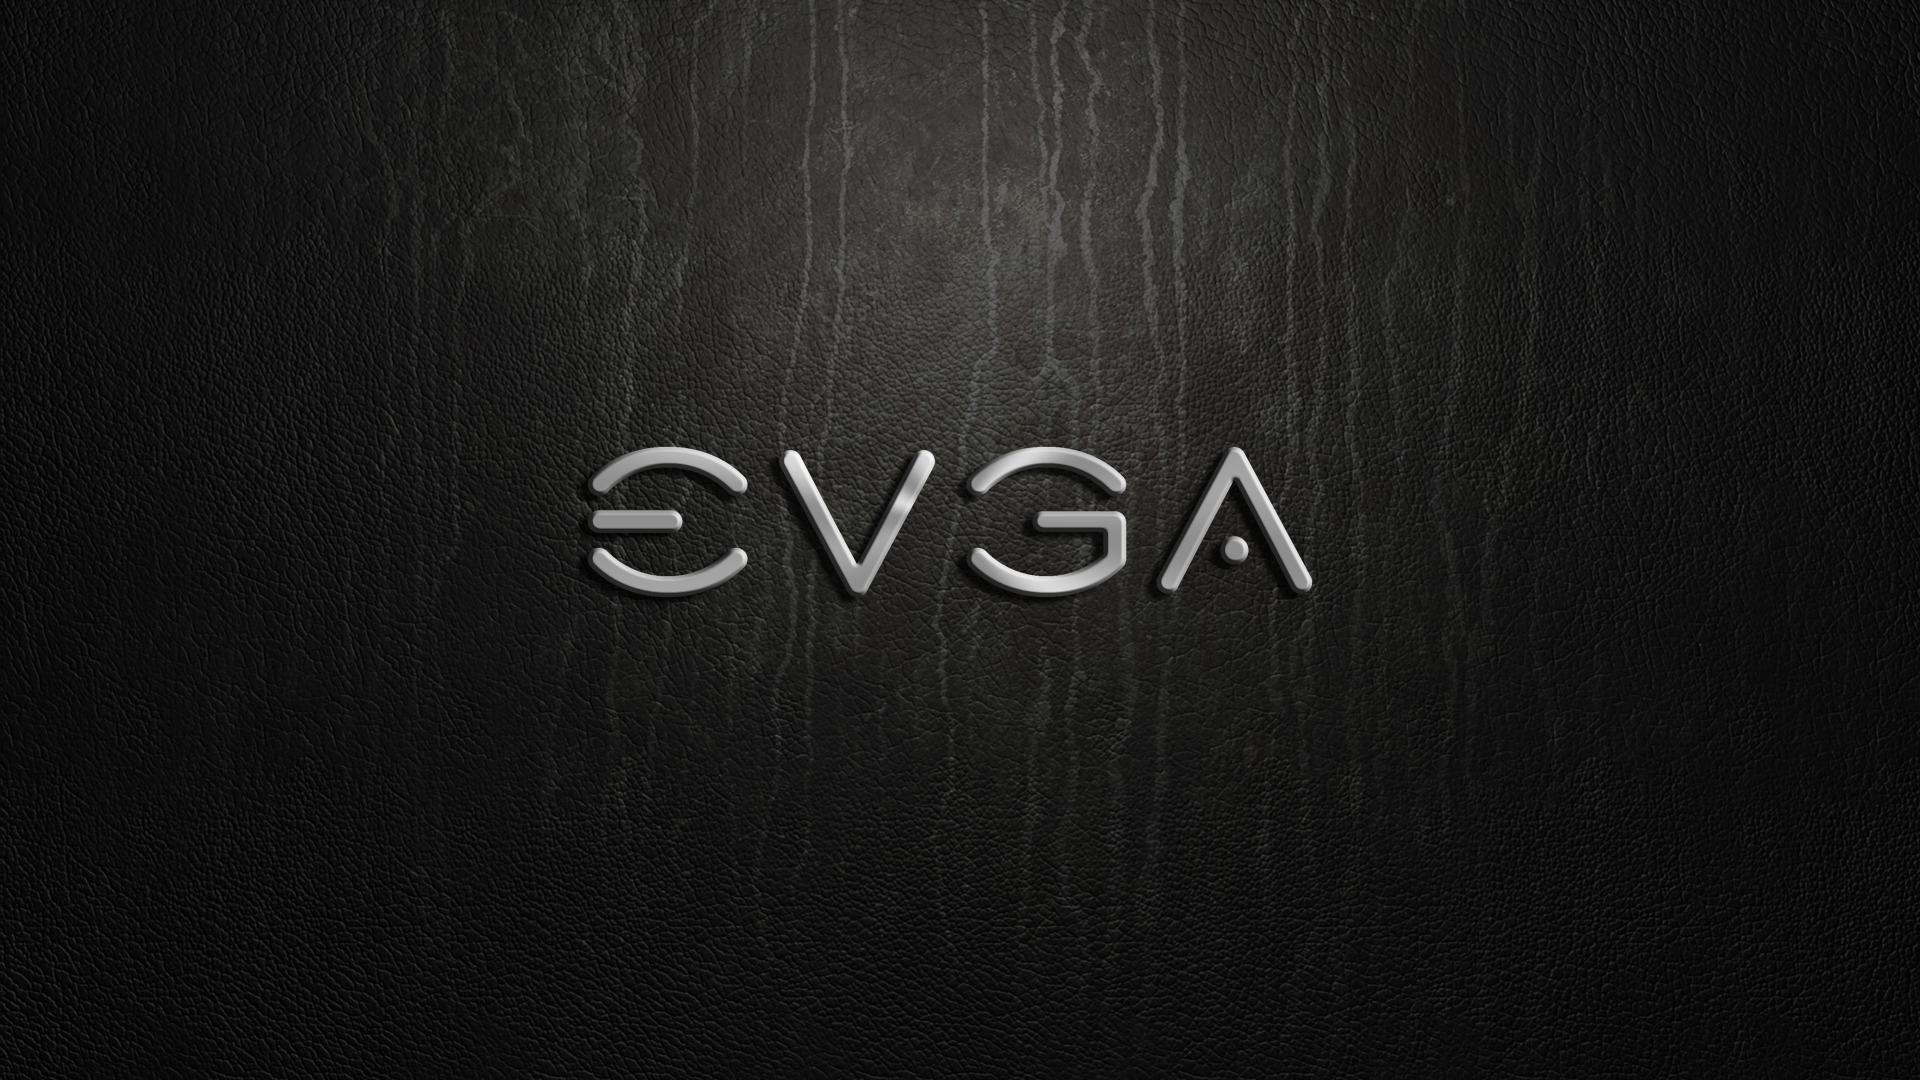 EVGA wallpaper #